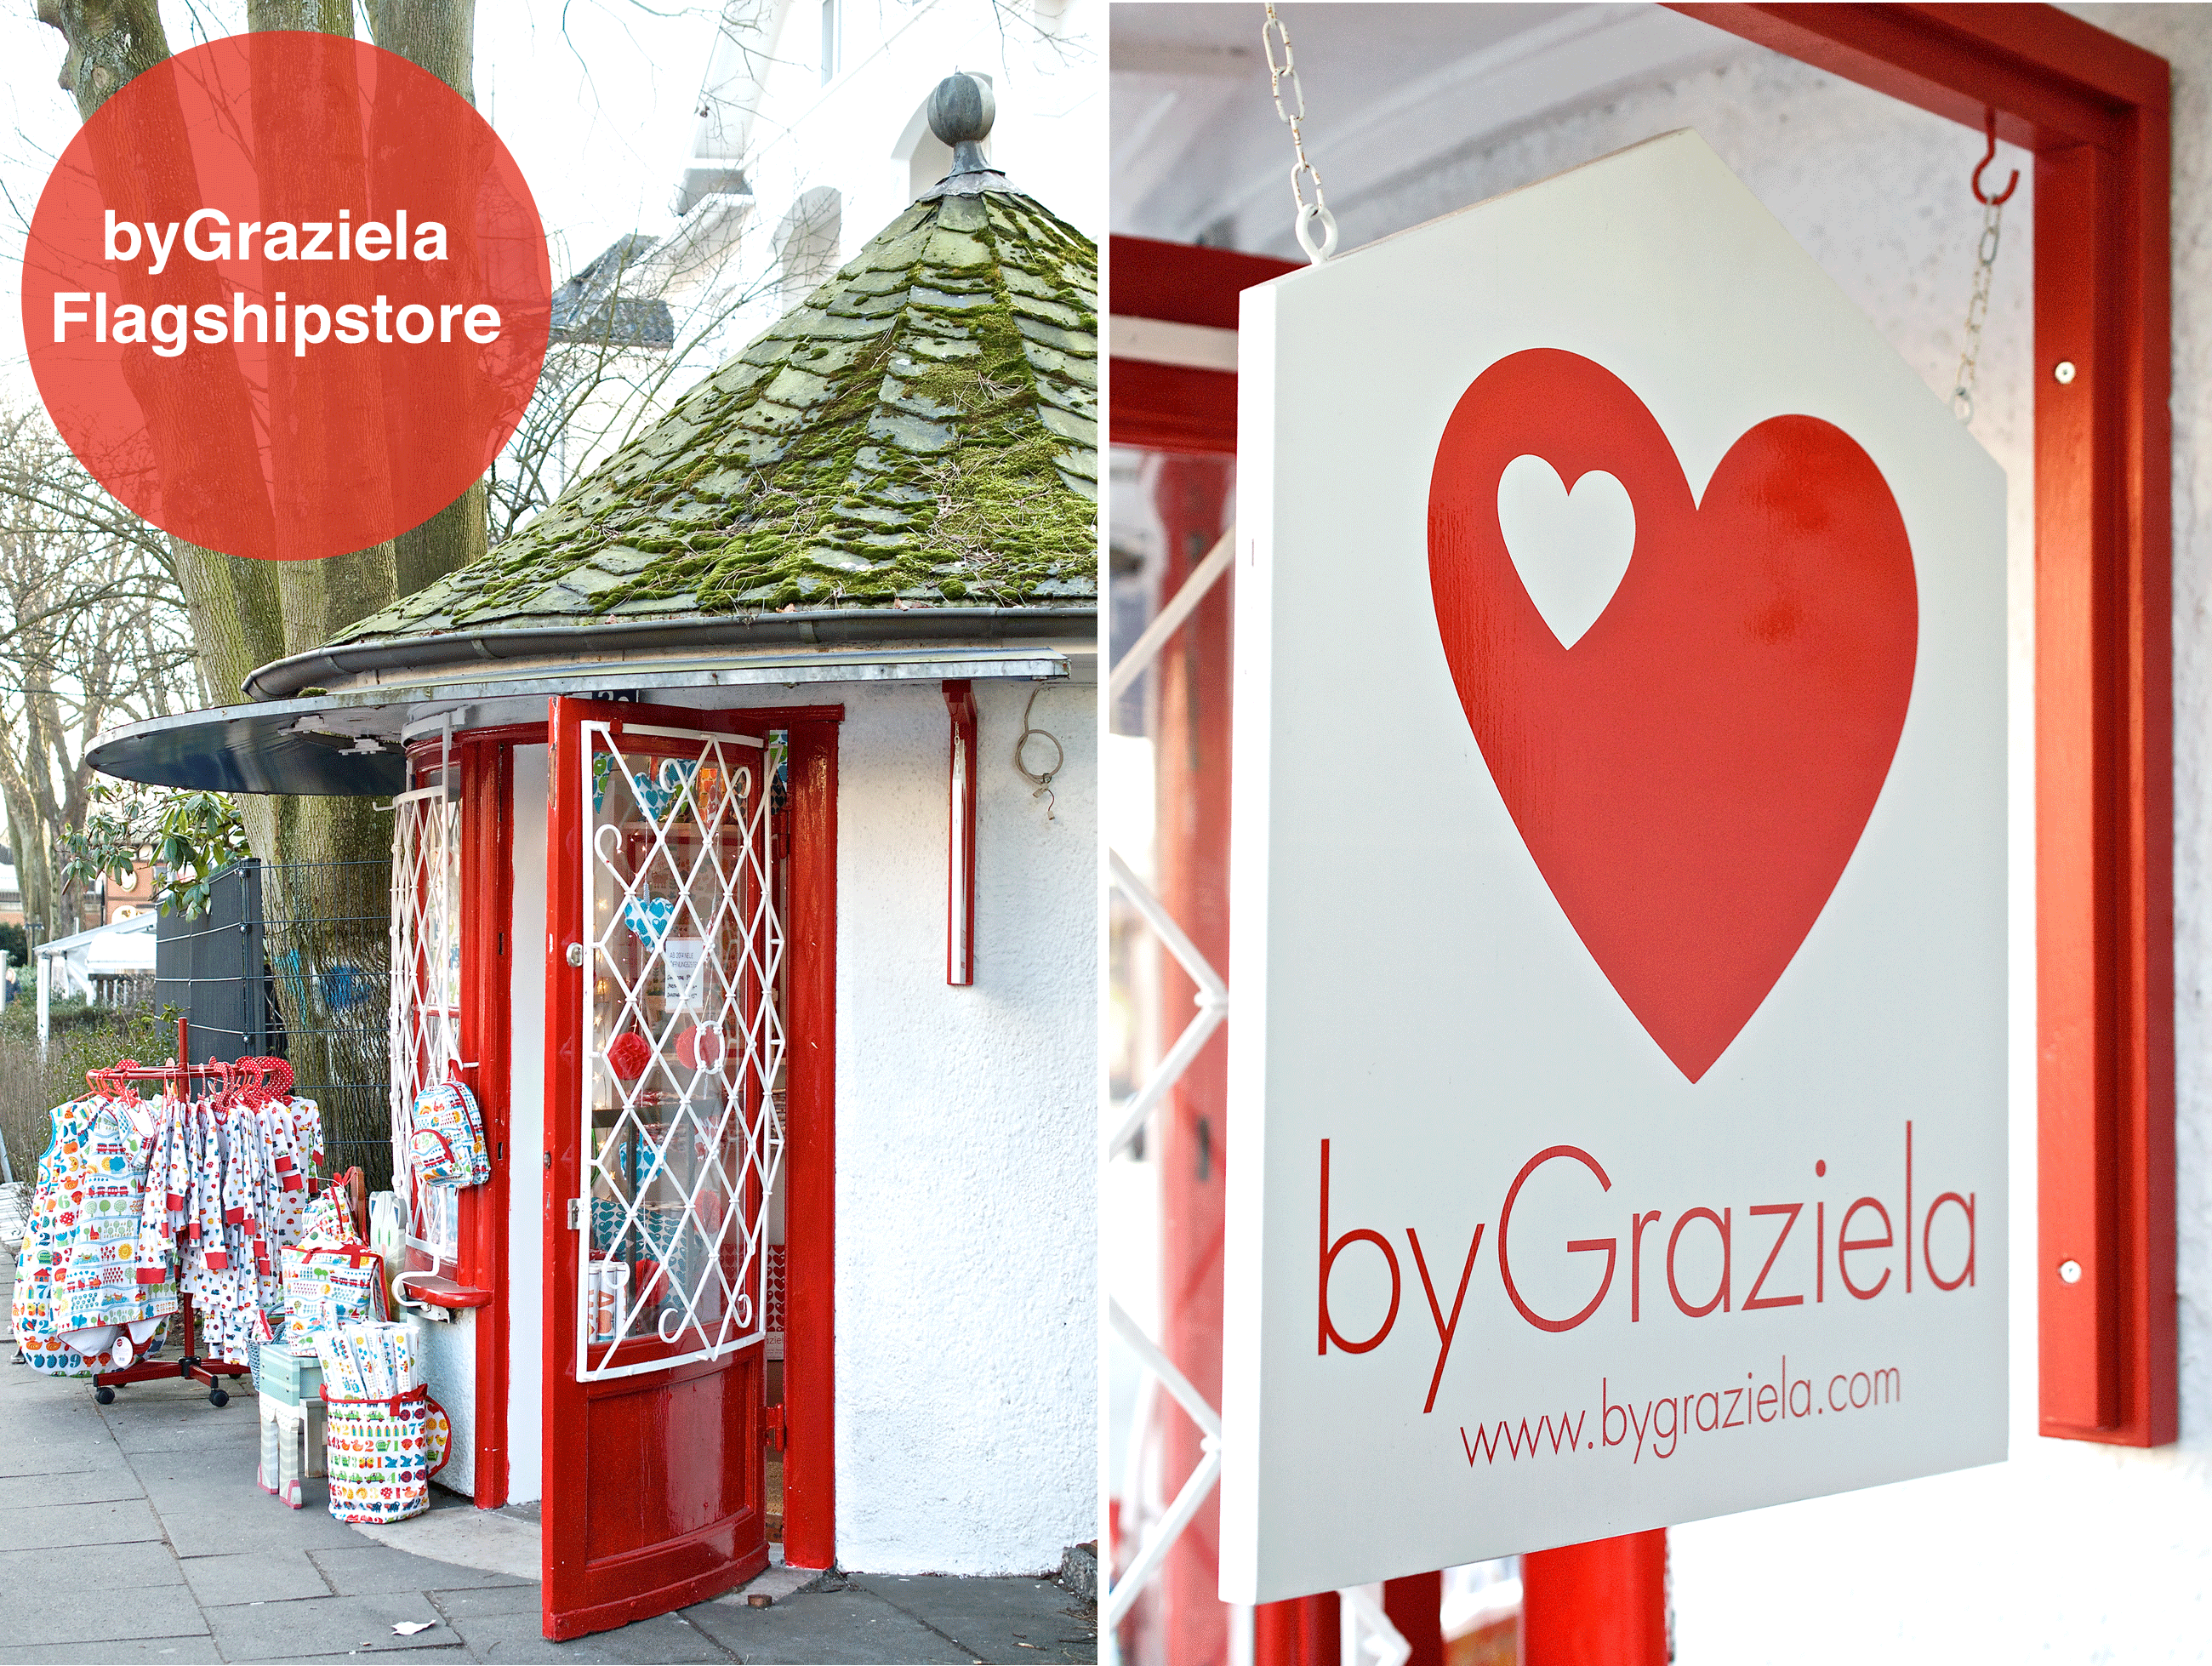 byGraziela Mini Flagshipstore in Hamburg